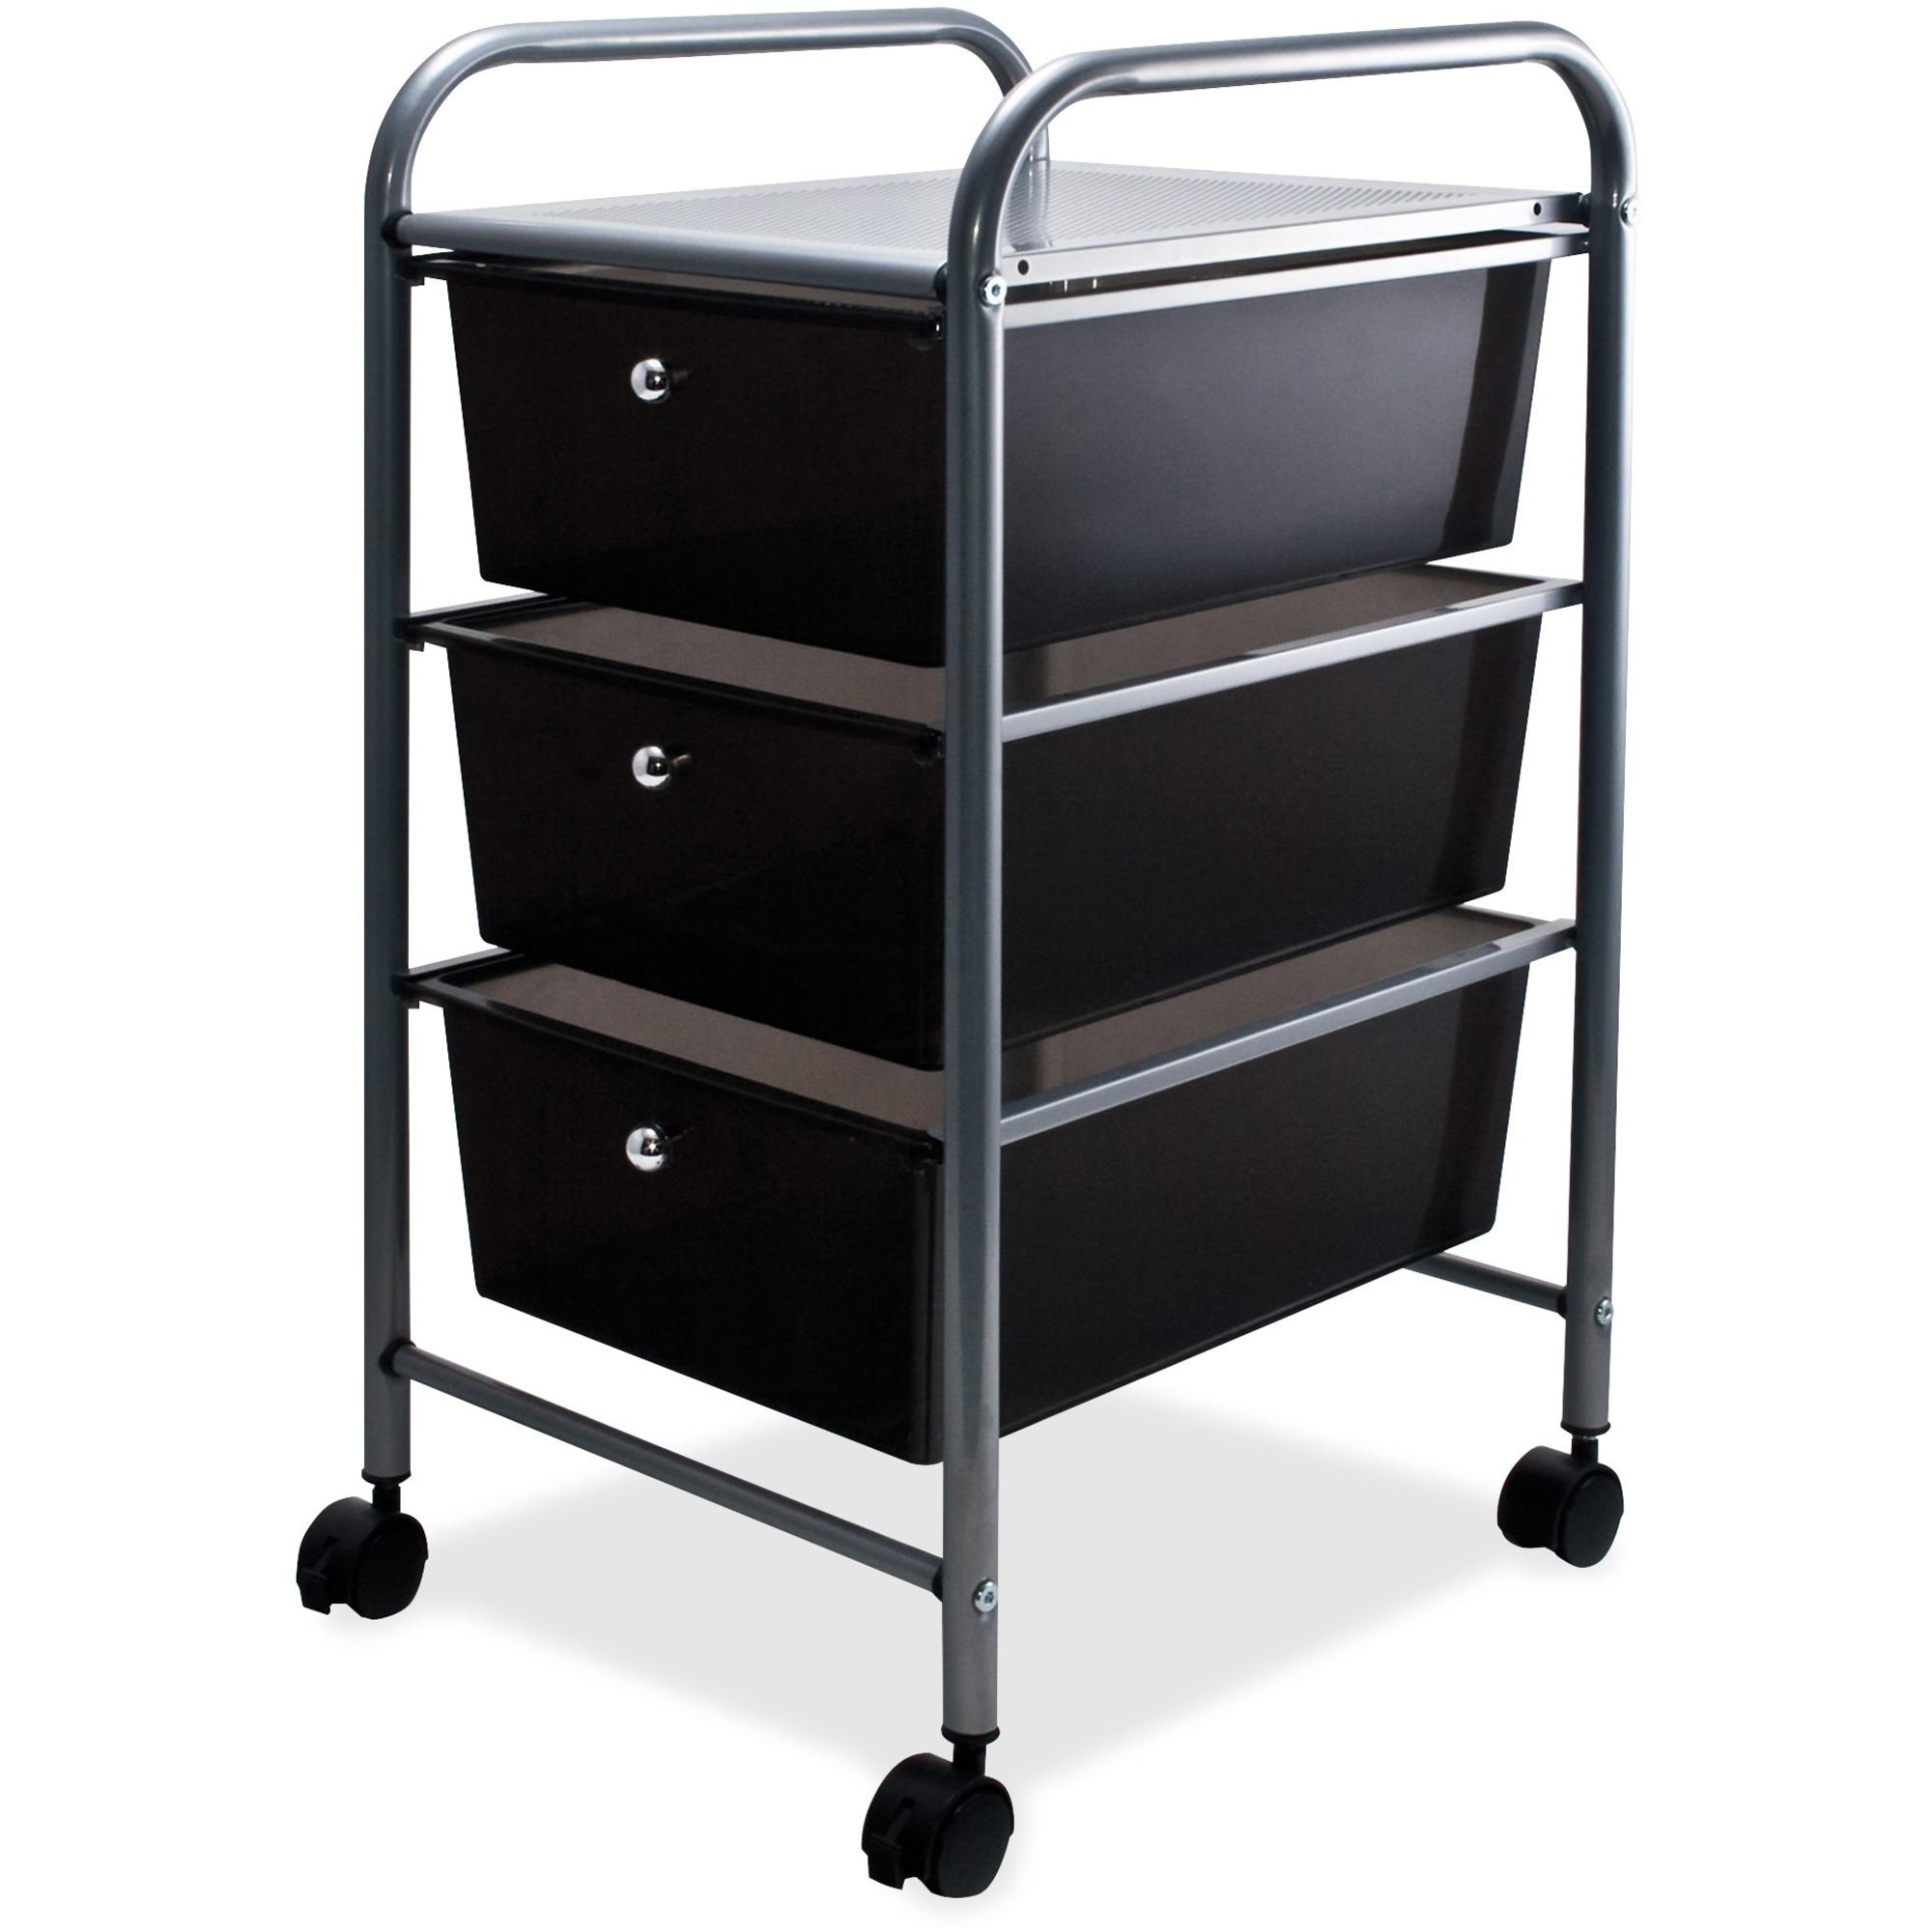 ingenuity organizer drawer rustic desktop organiser accessories set most wonderful white desk office gold sorter drawers file and